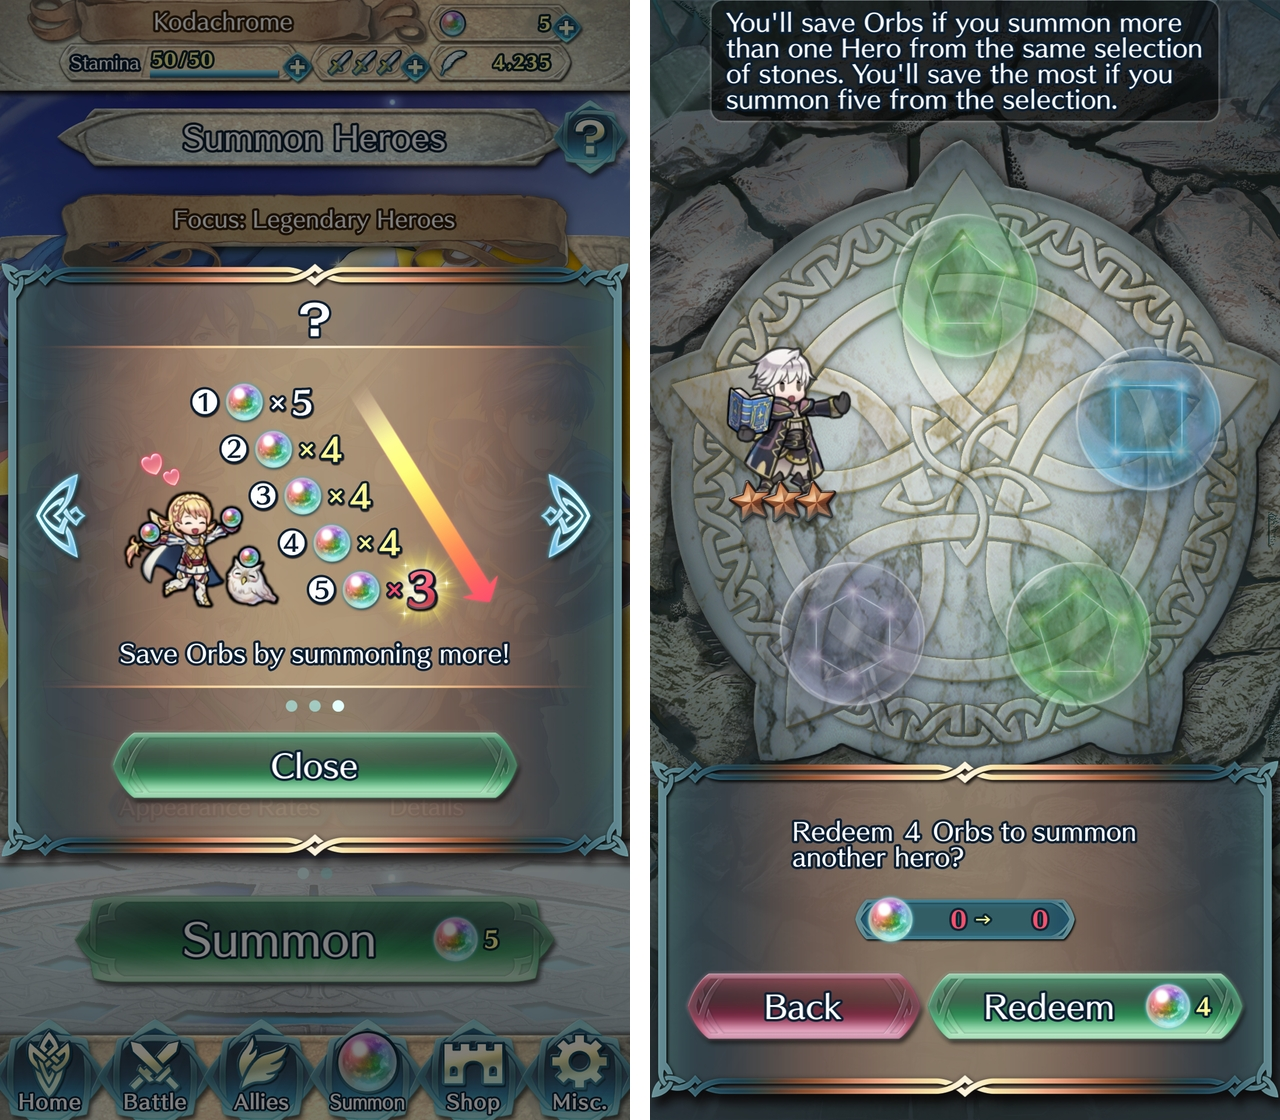 Fire Emblem Heroes summoning screen